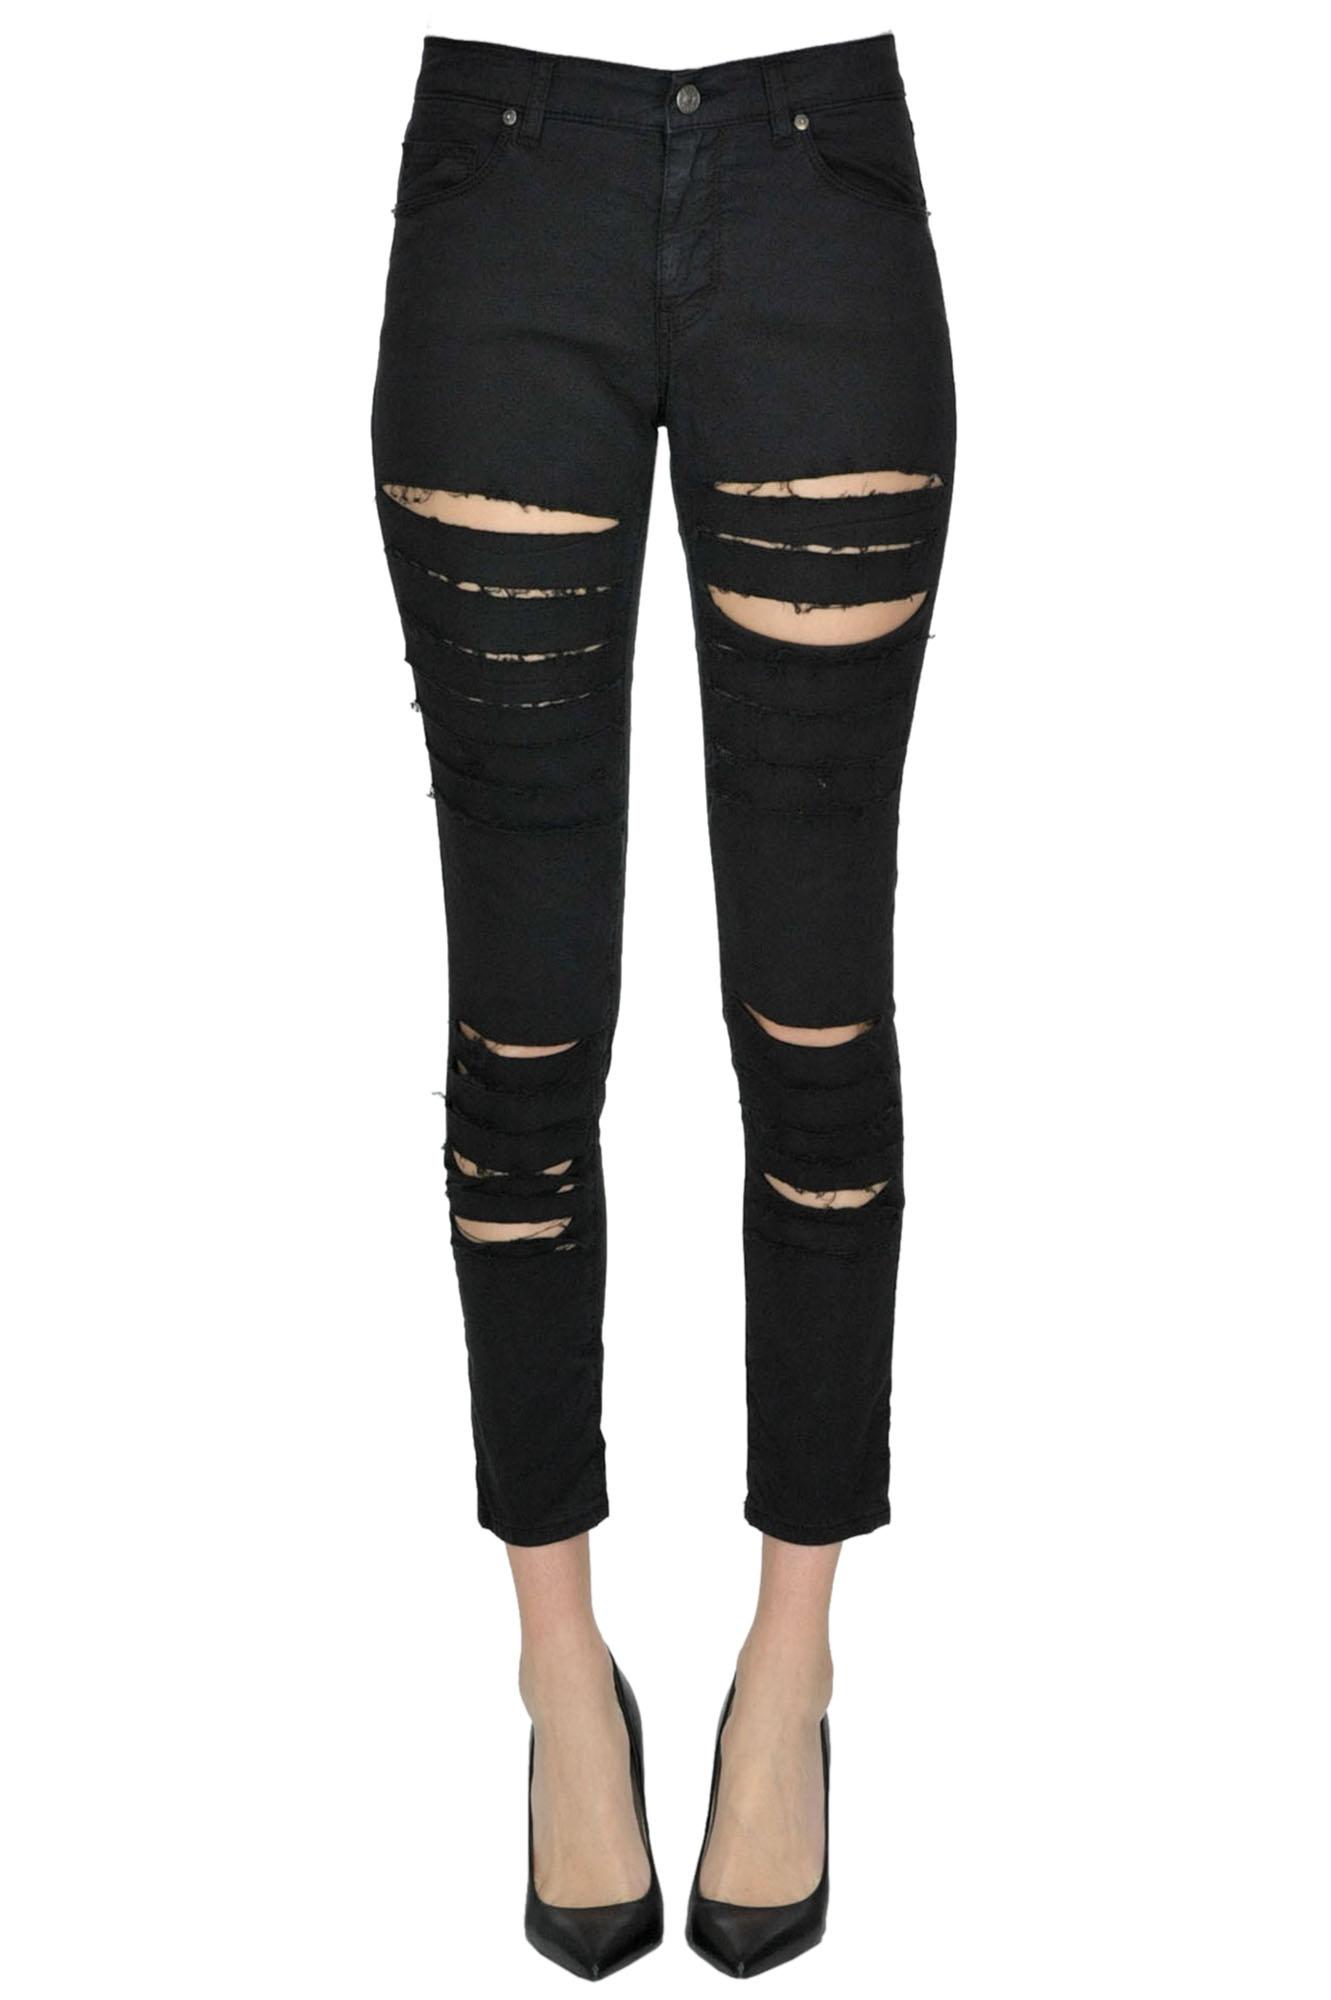 GAELLE PARIS Destroyed Jeans in Black